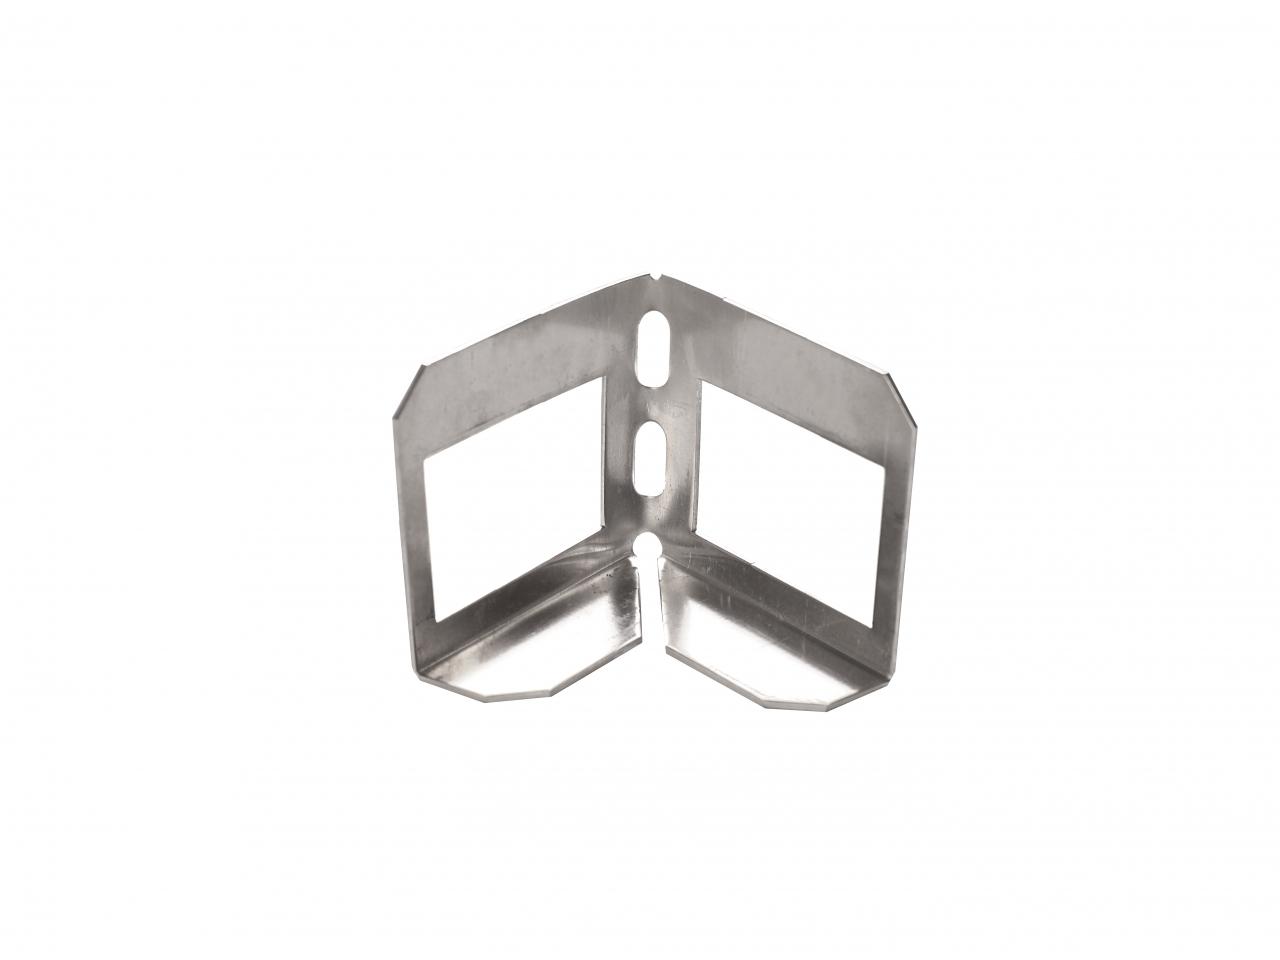 Eck-Verbinder in Aluminium für Kiesfangleisten